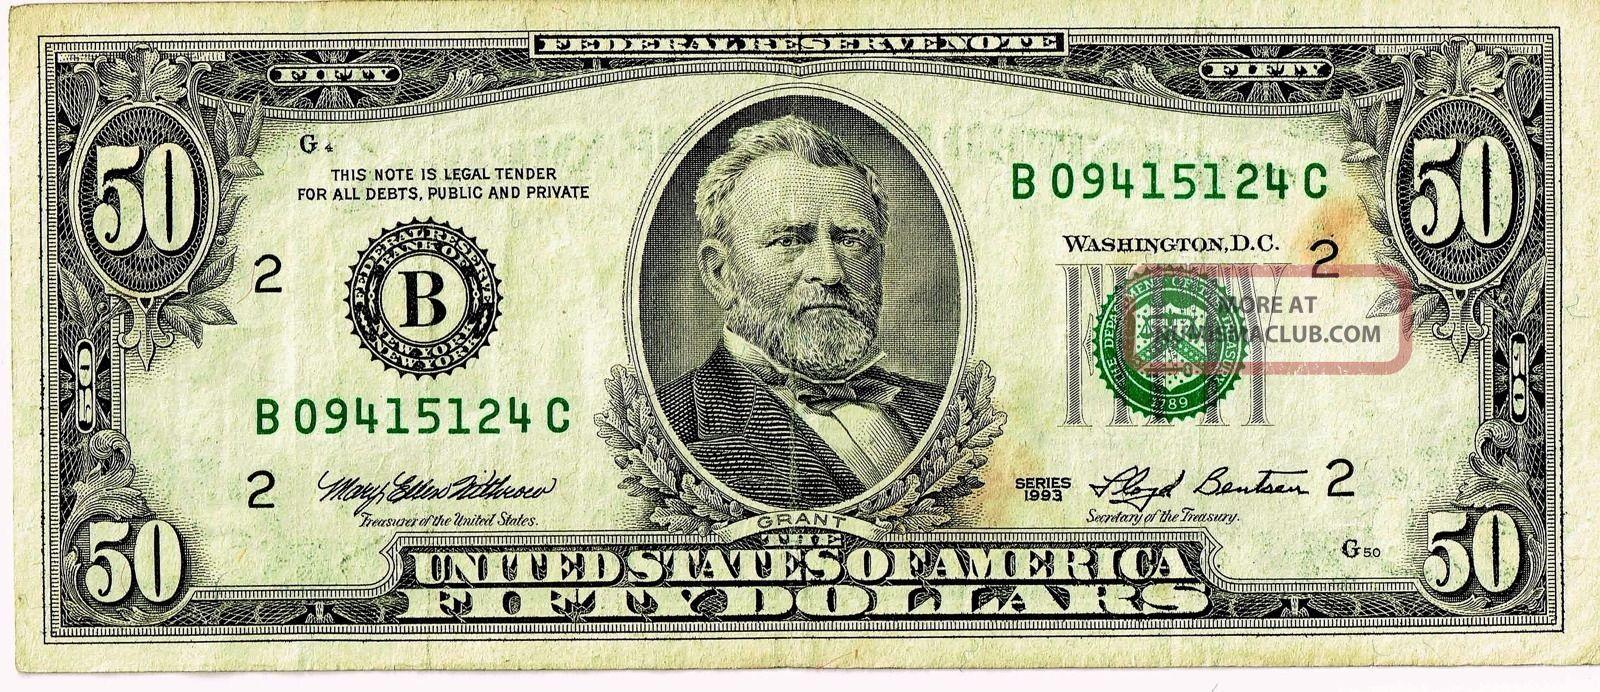 $50 Dollar Bill, 1993 Series, Frn, Federal Reserve Note